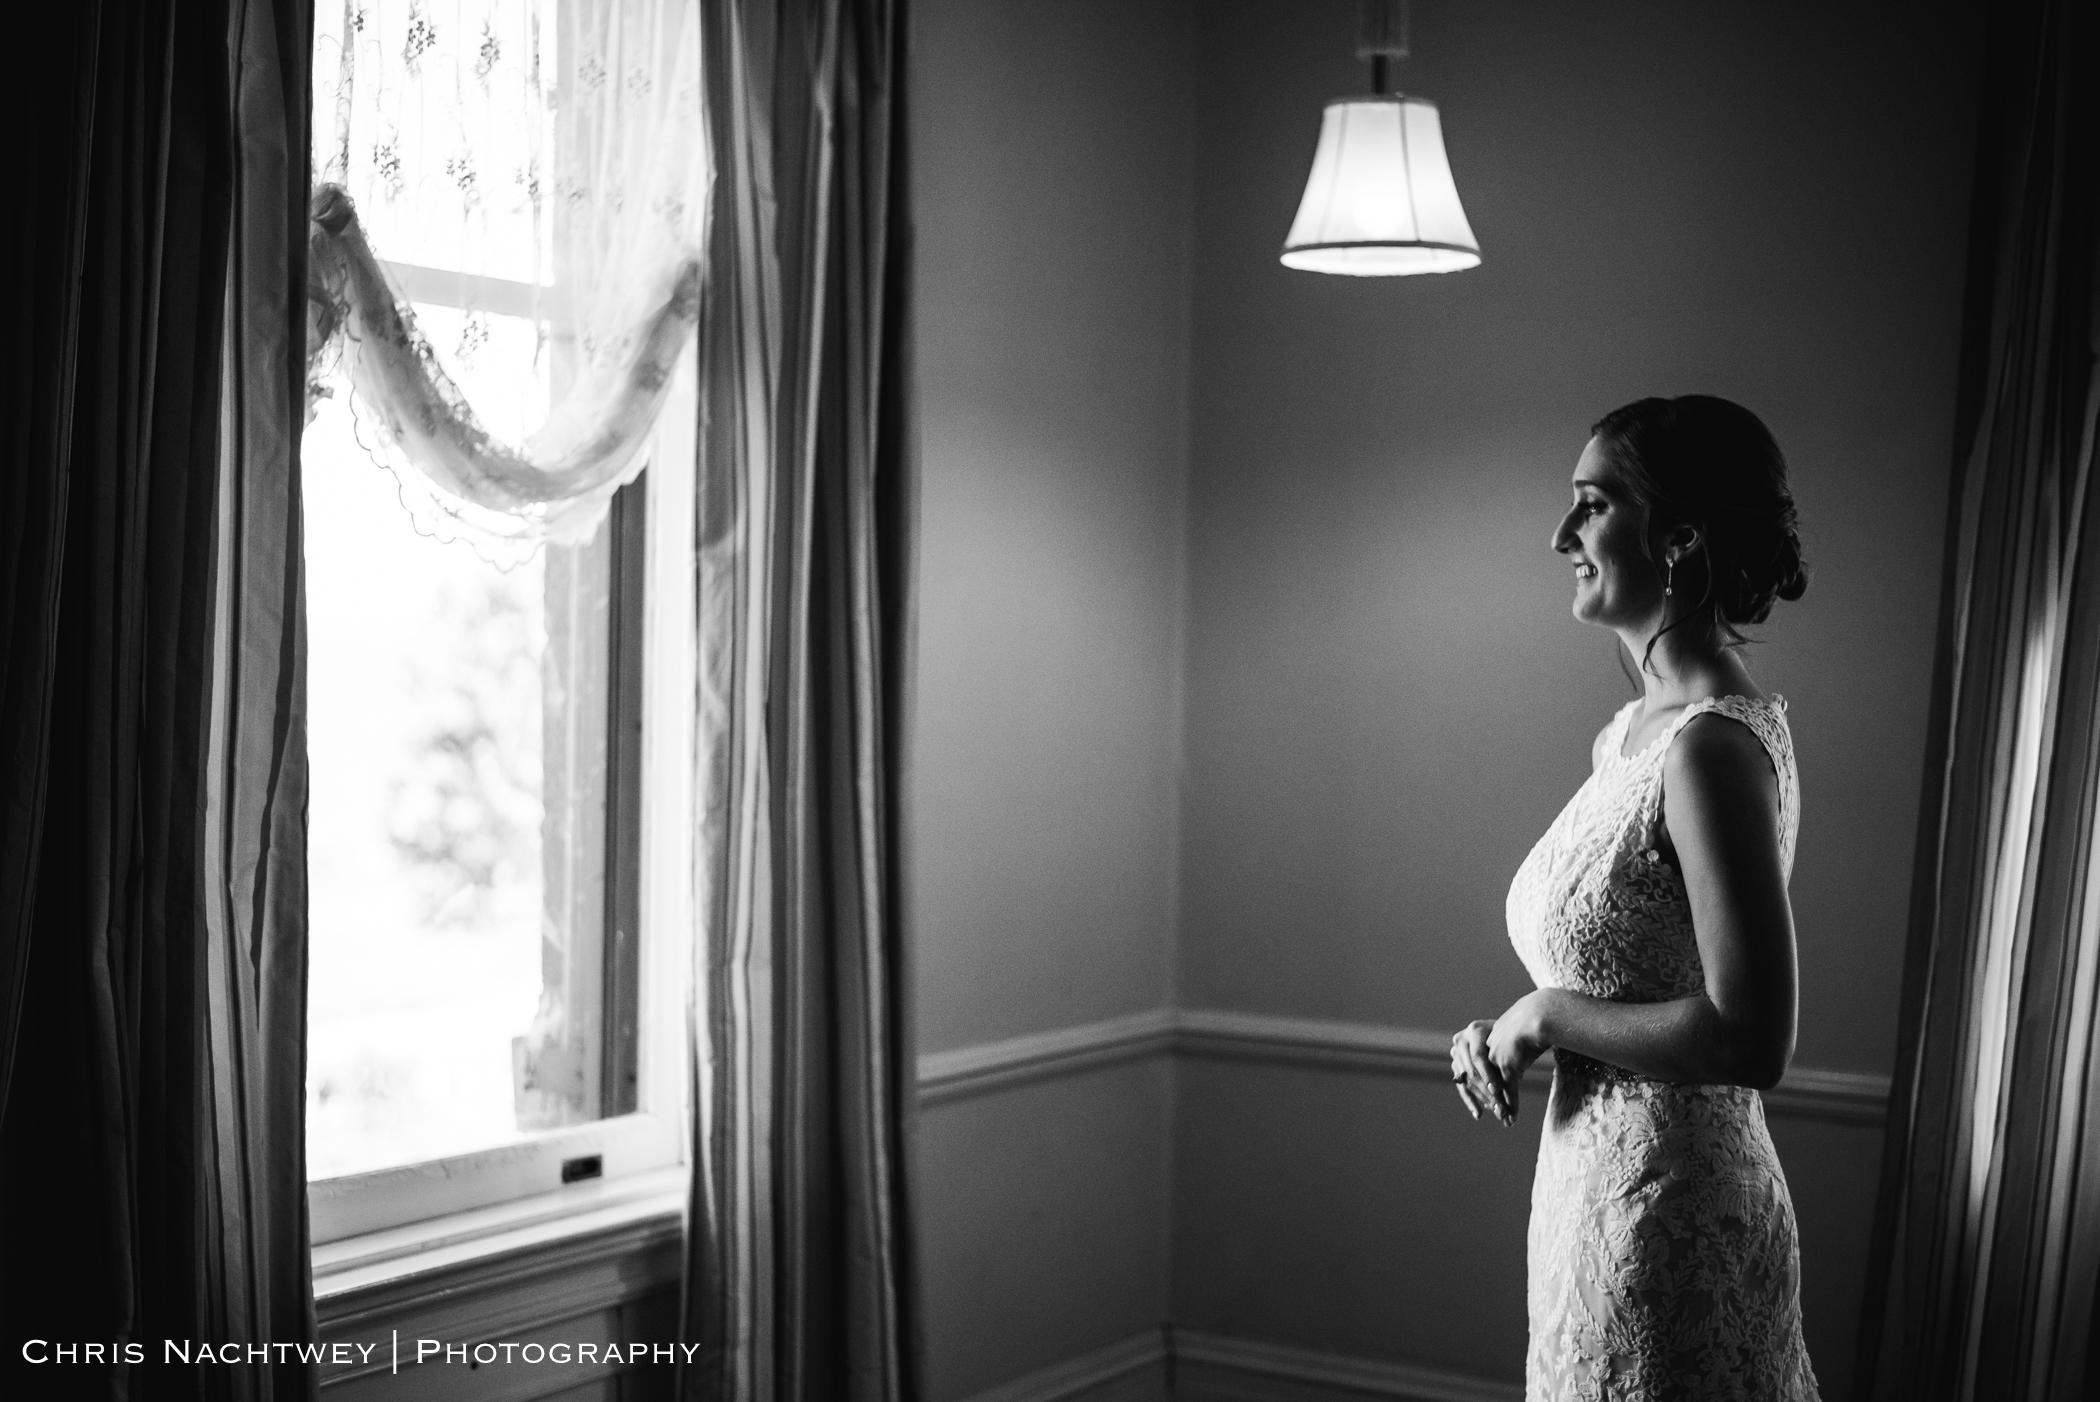 harkness-wedding-photos-chris-nachtwey-photography-2018-8.jpg